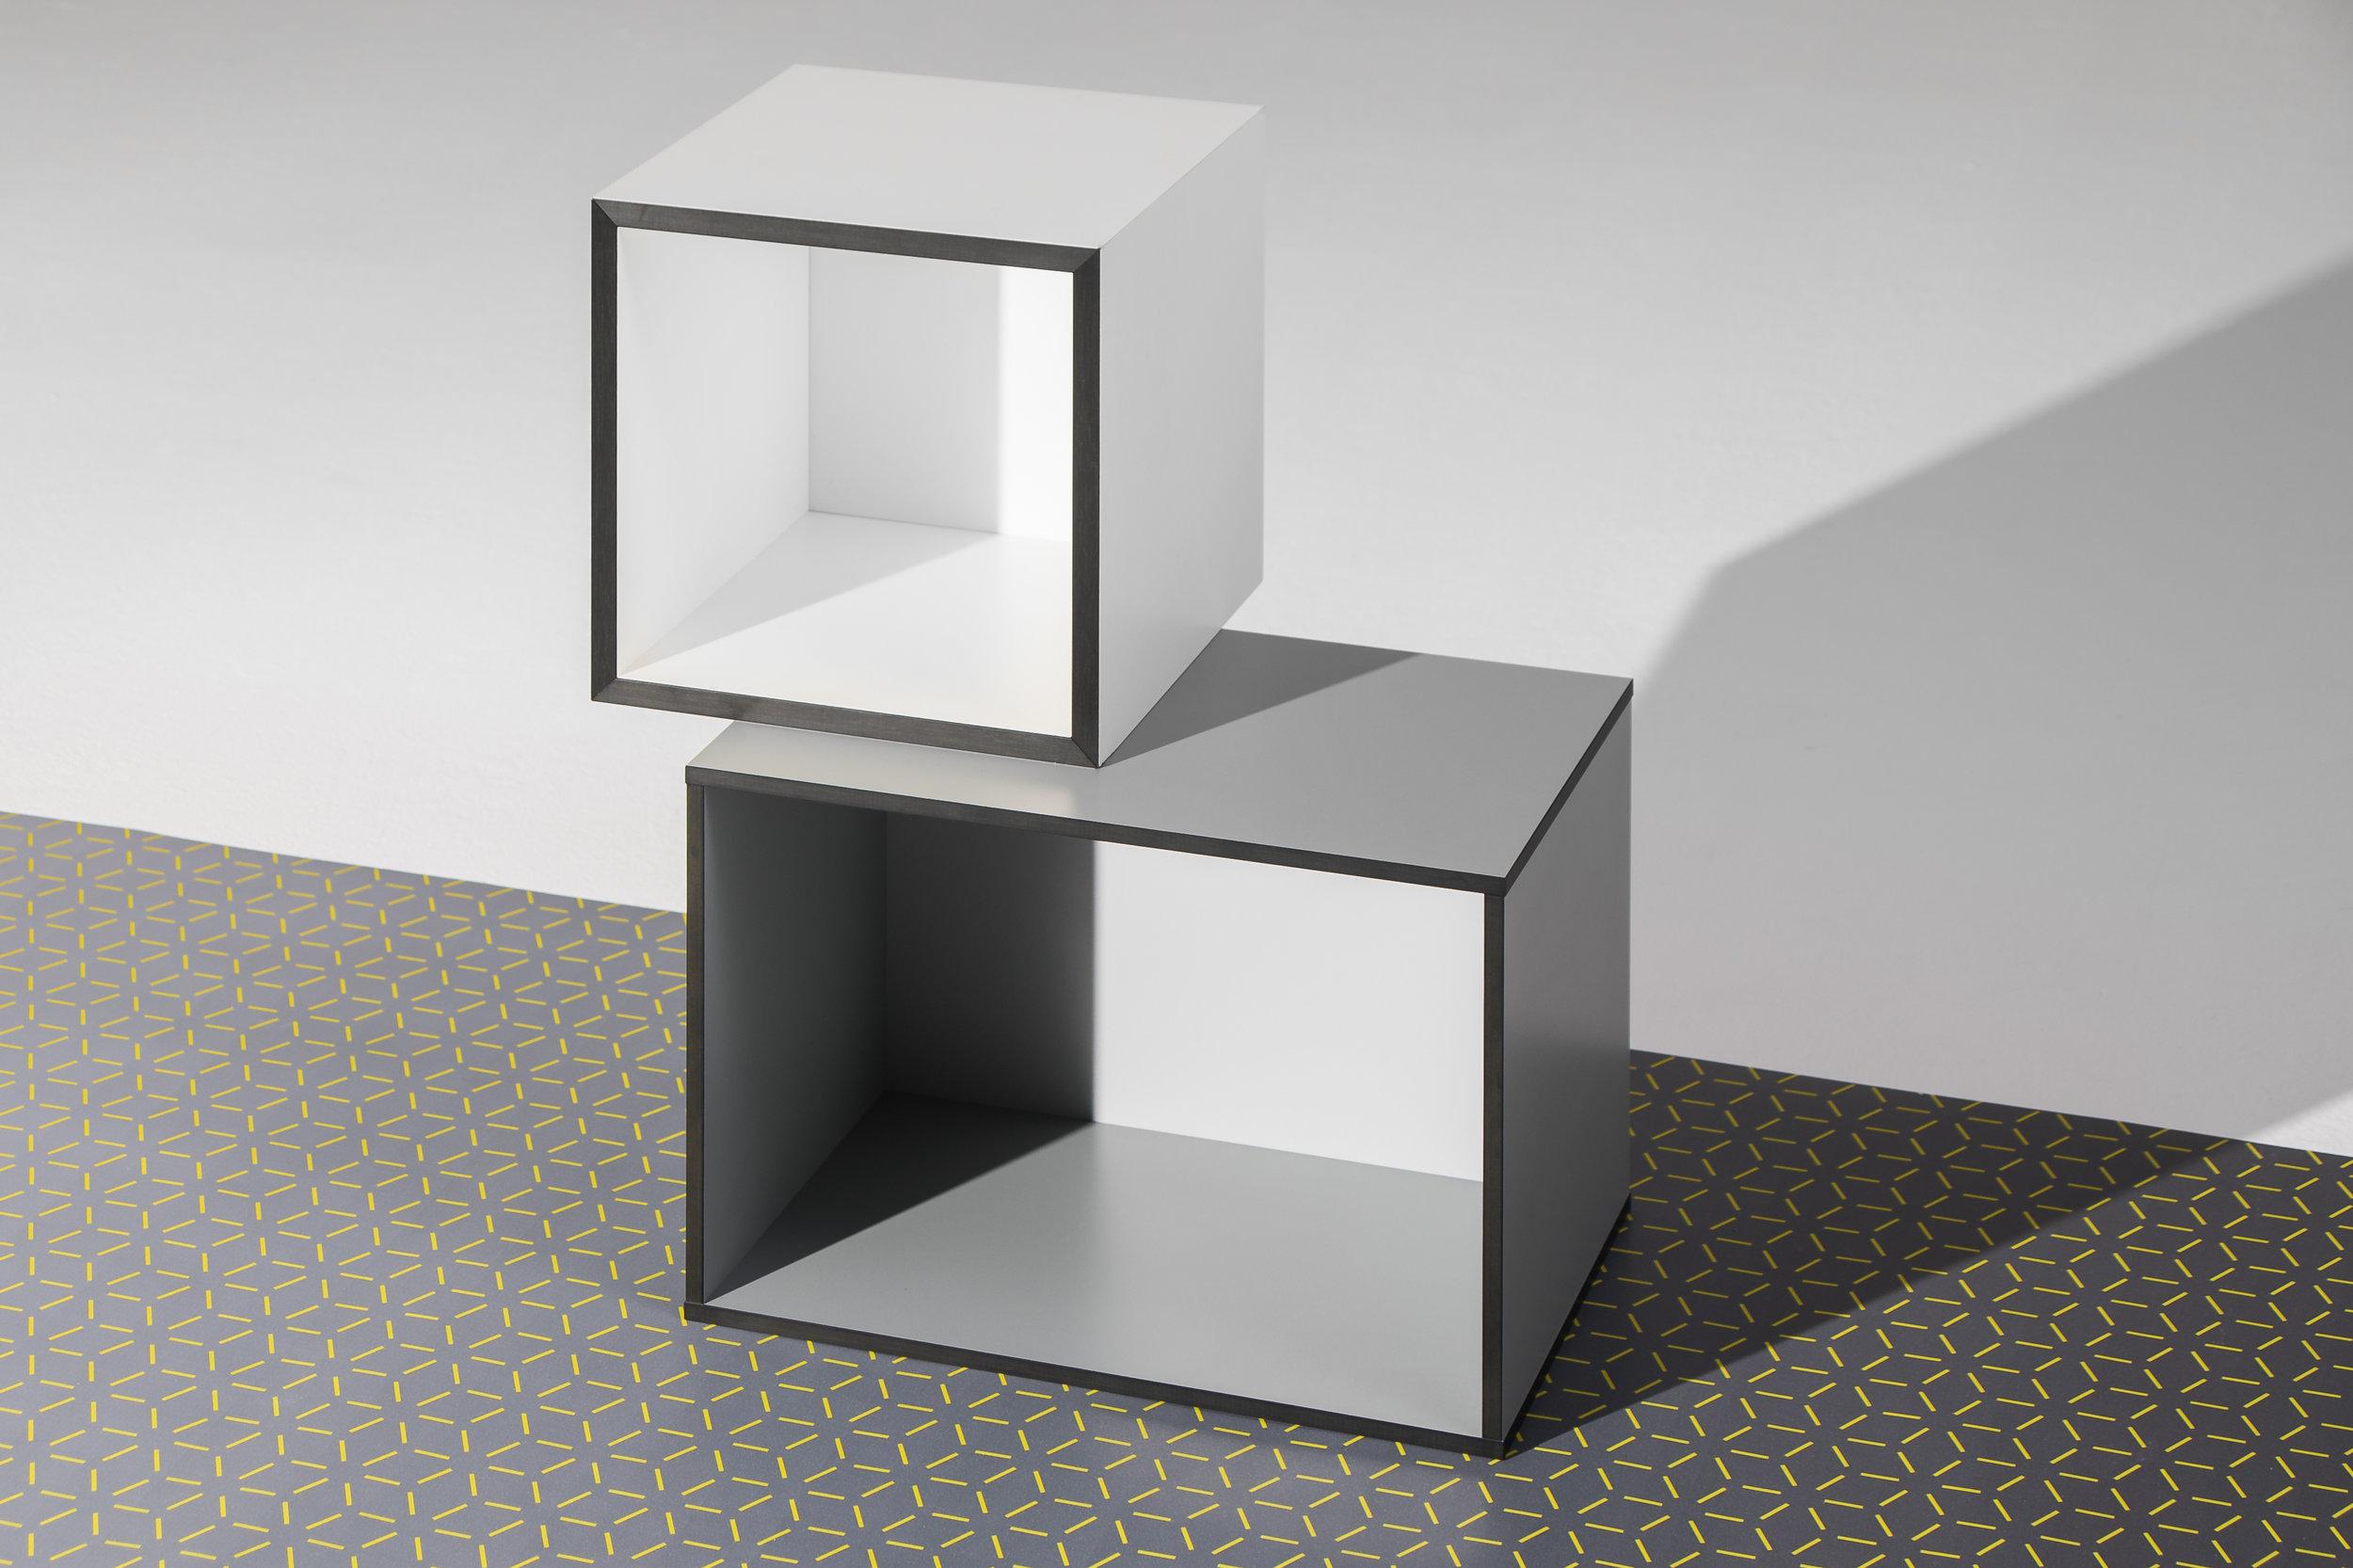 Abet Laminati - 公司生产书柜/书架